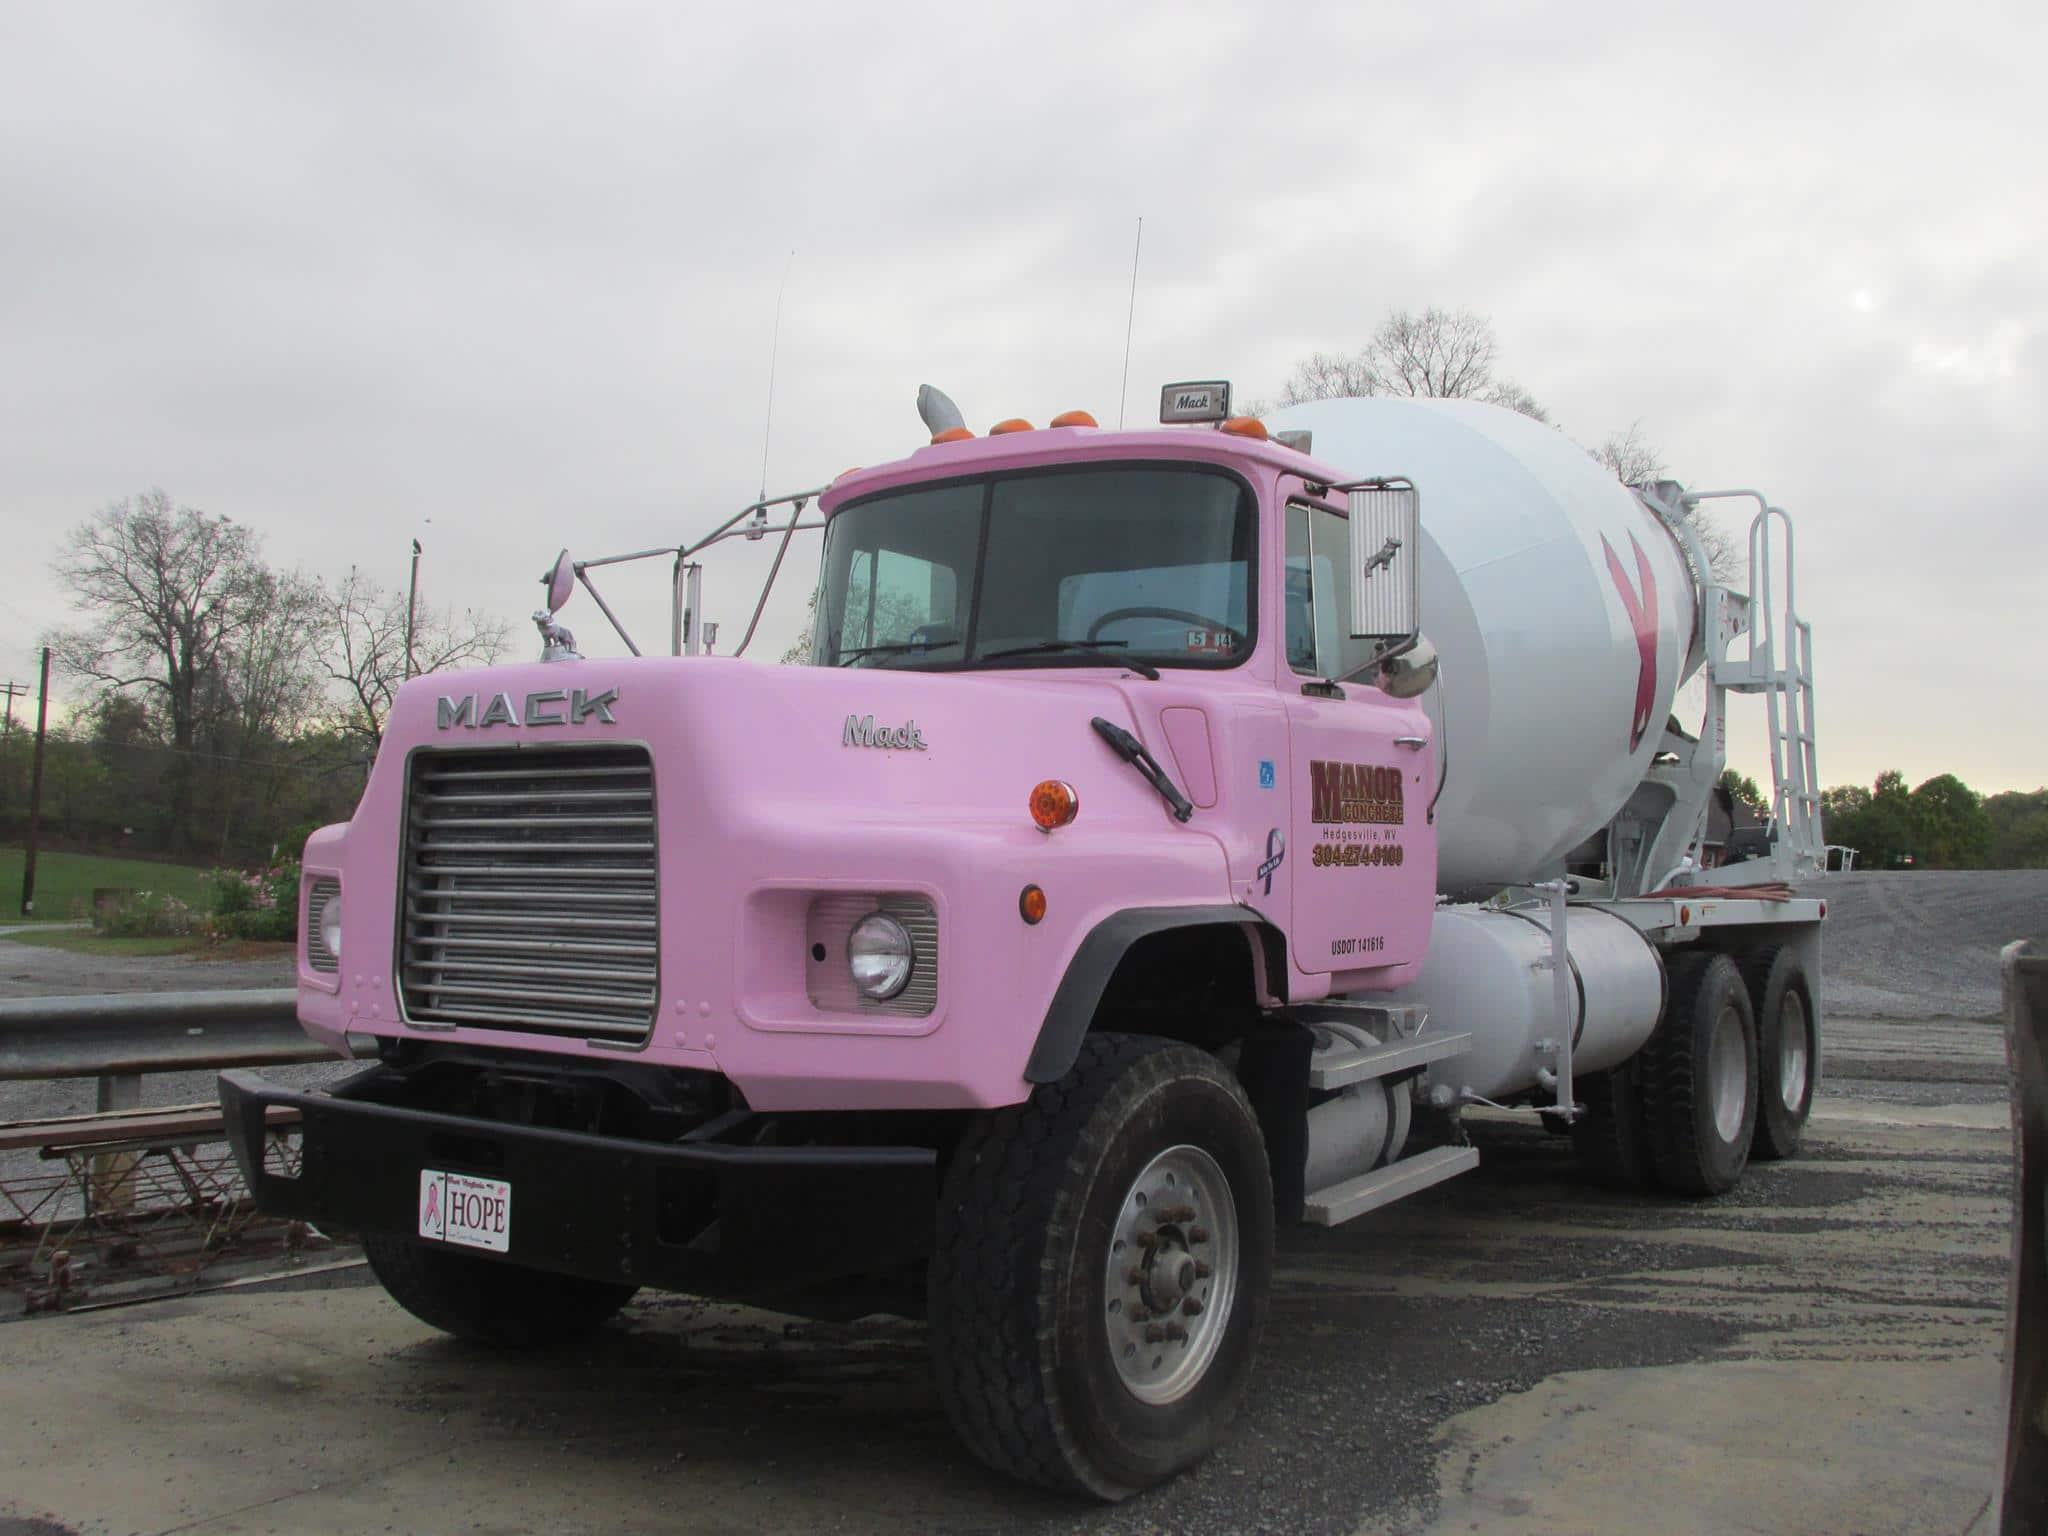 cancer truck